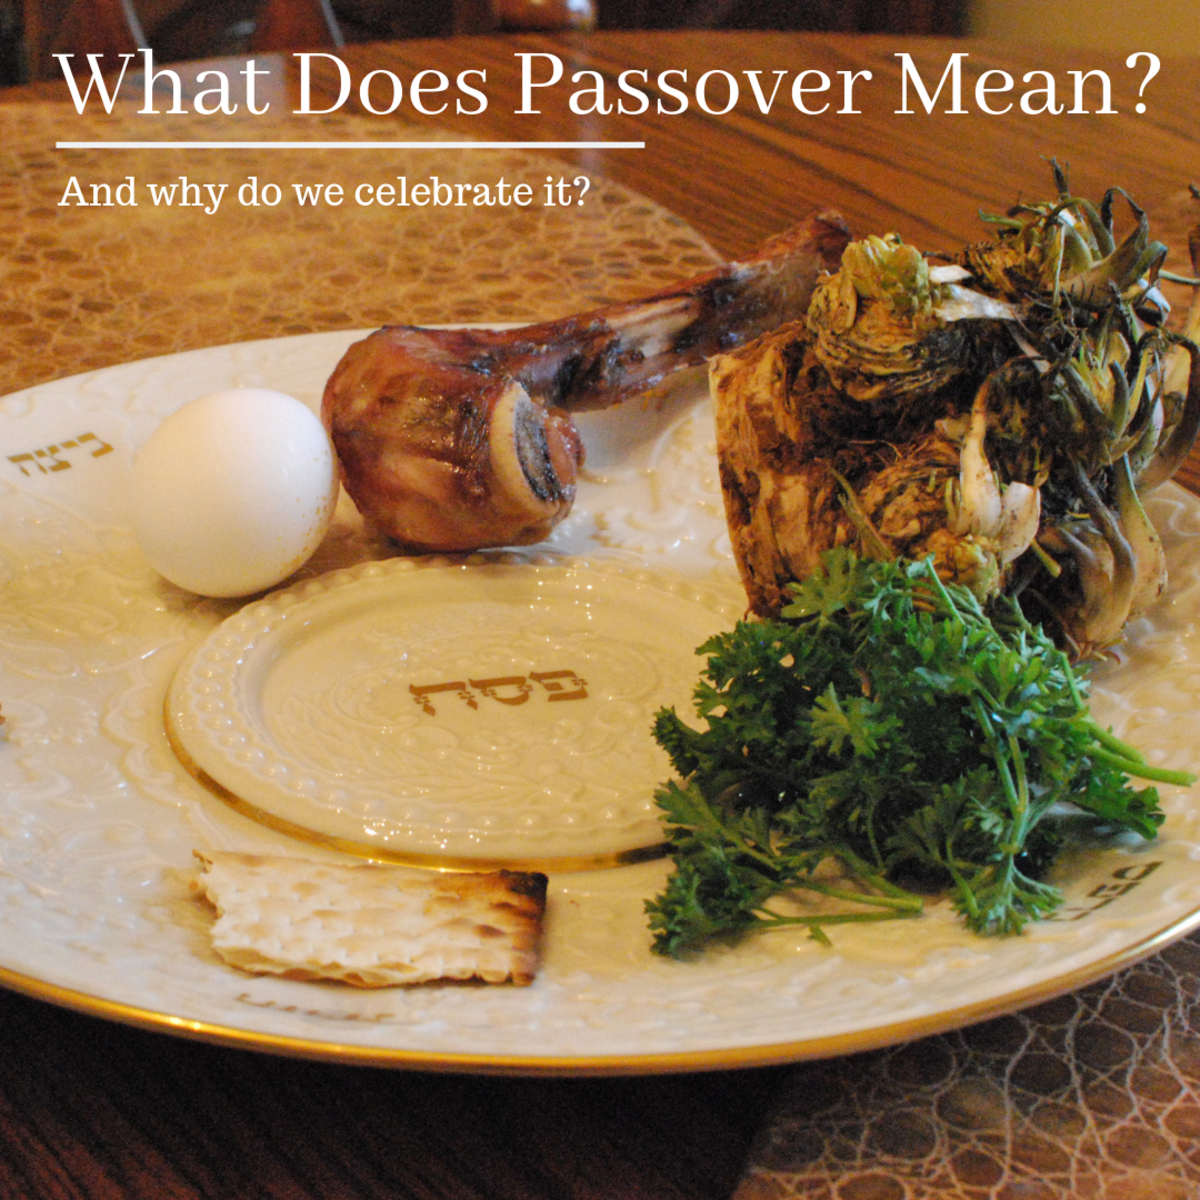 Why Do Jews Celebrate Passover?